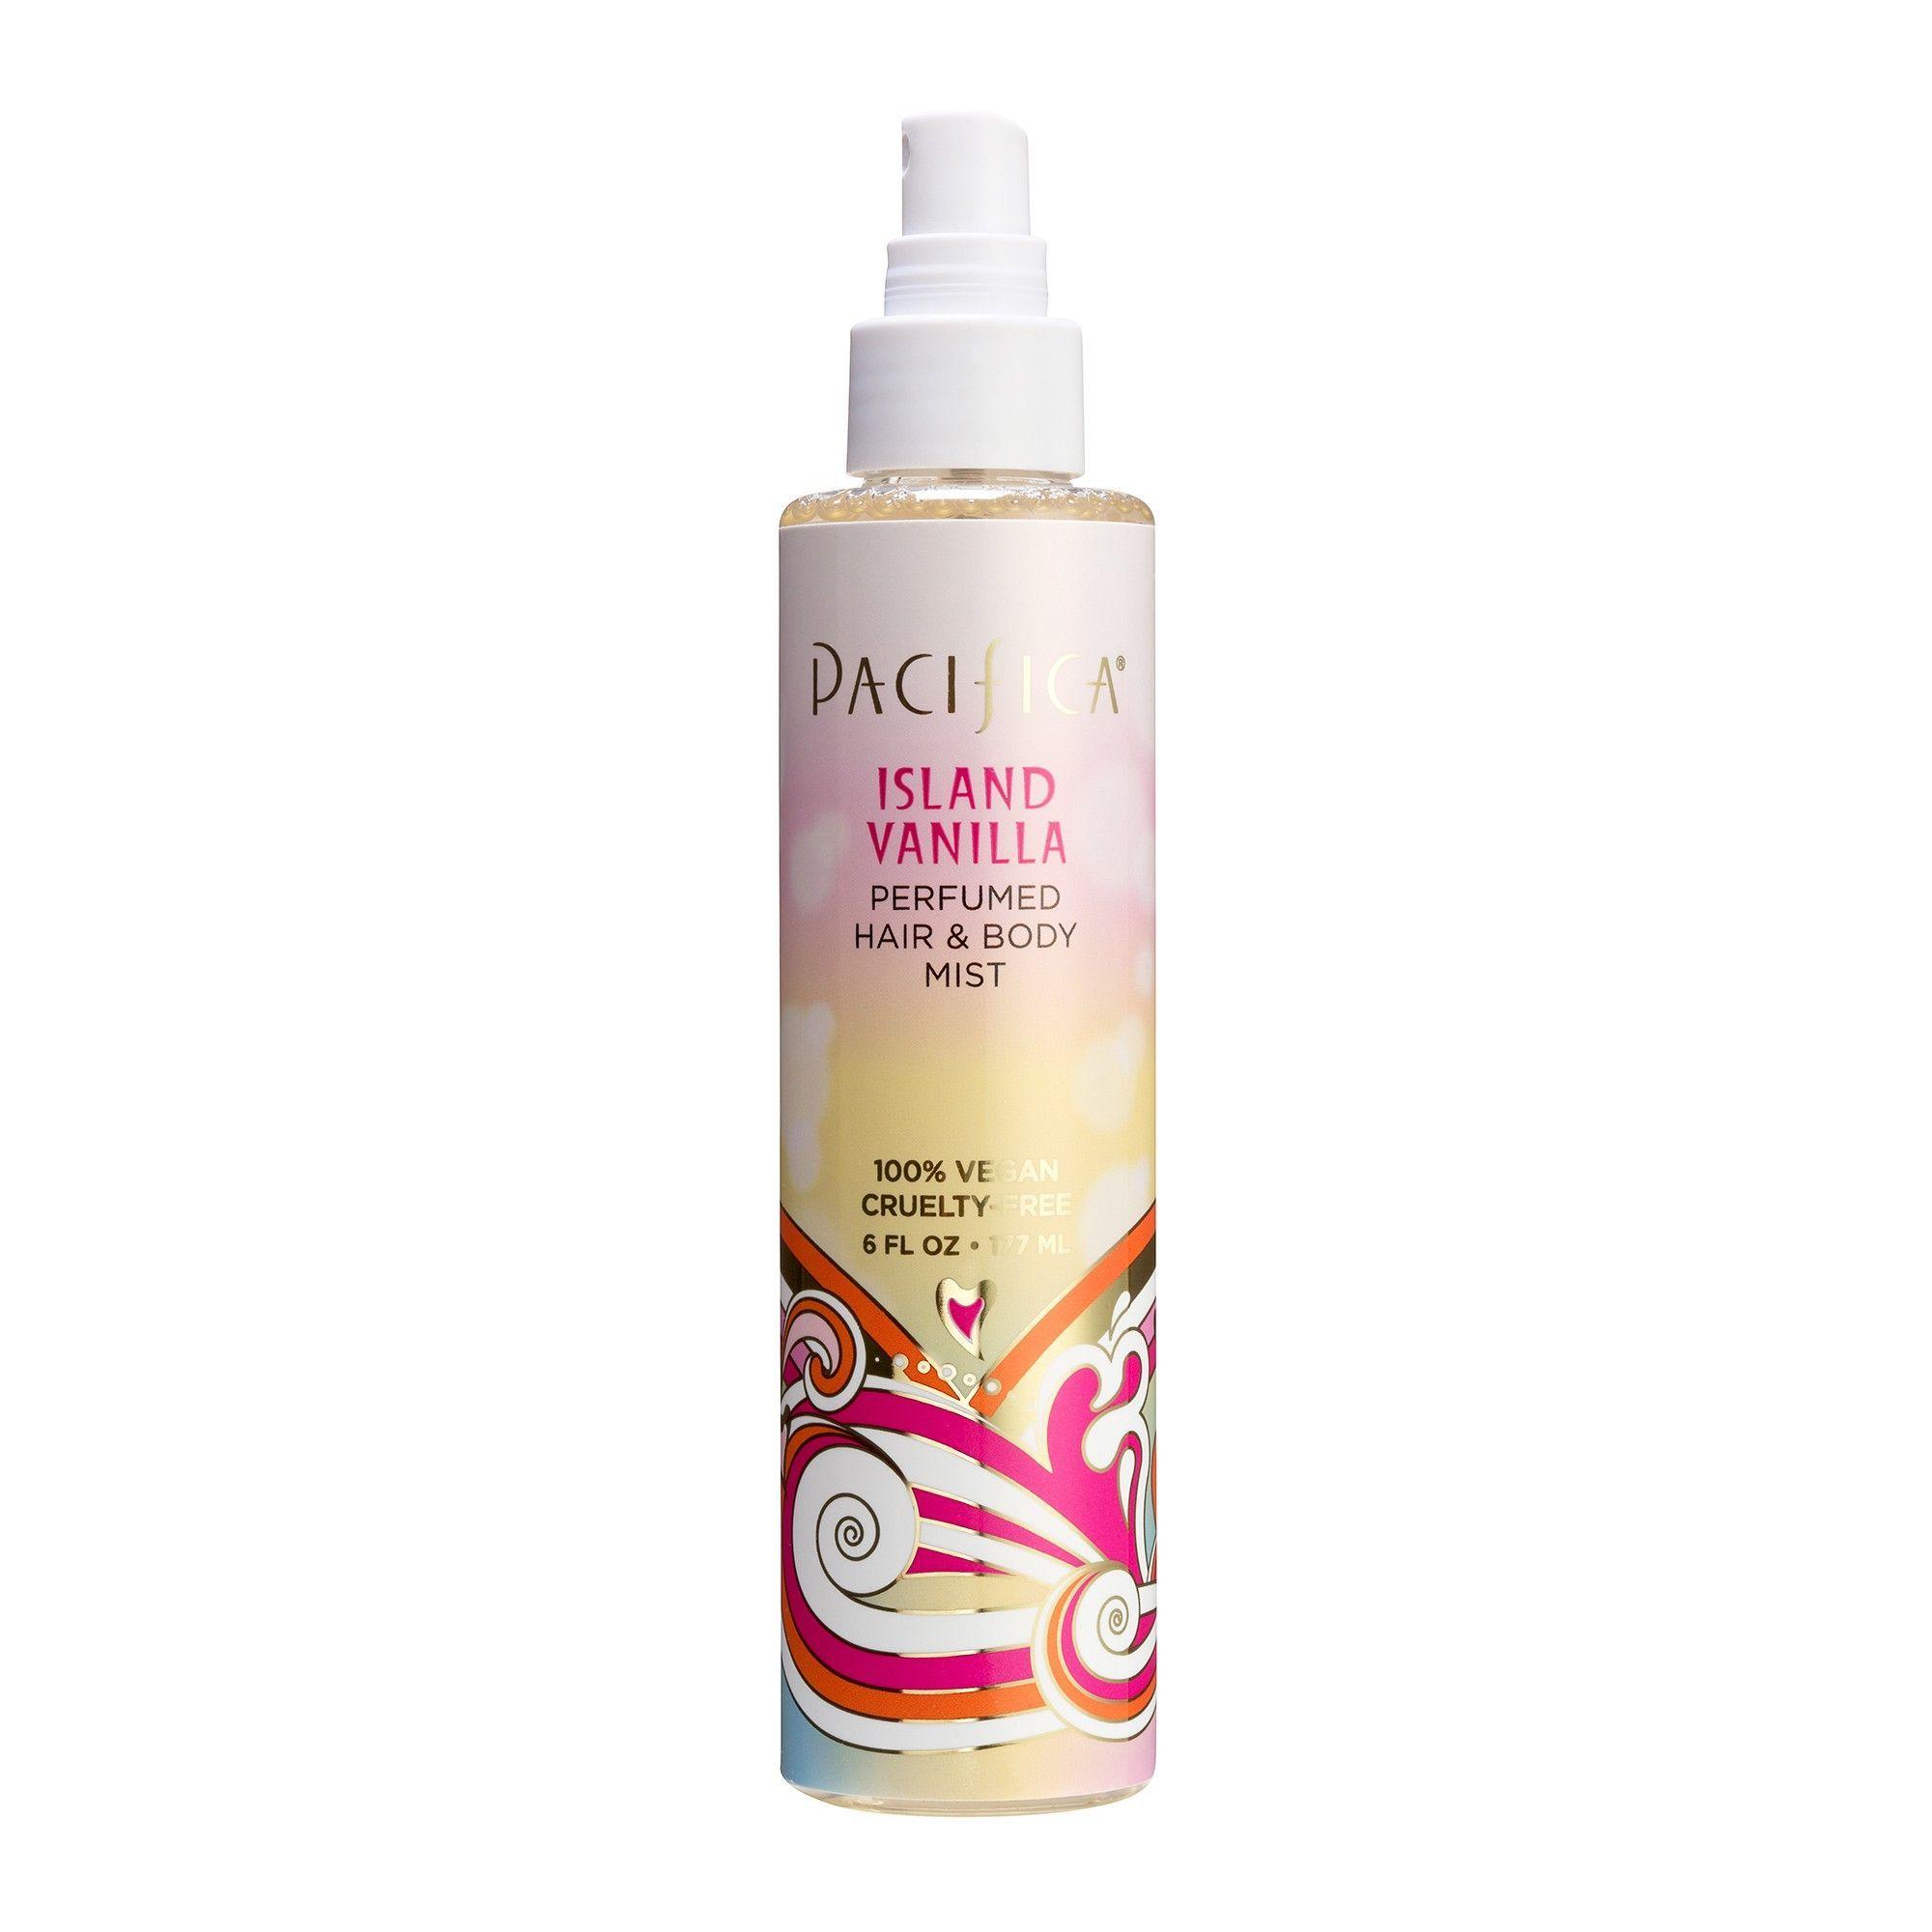 Island Vanilla by Pacifica Perfumed Hair & Body Mist Women